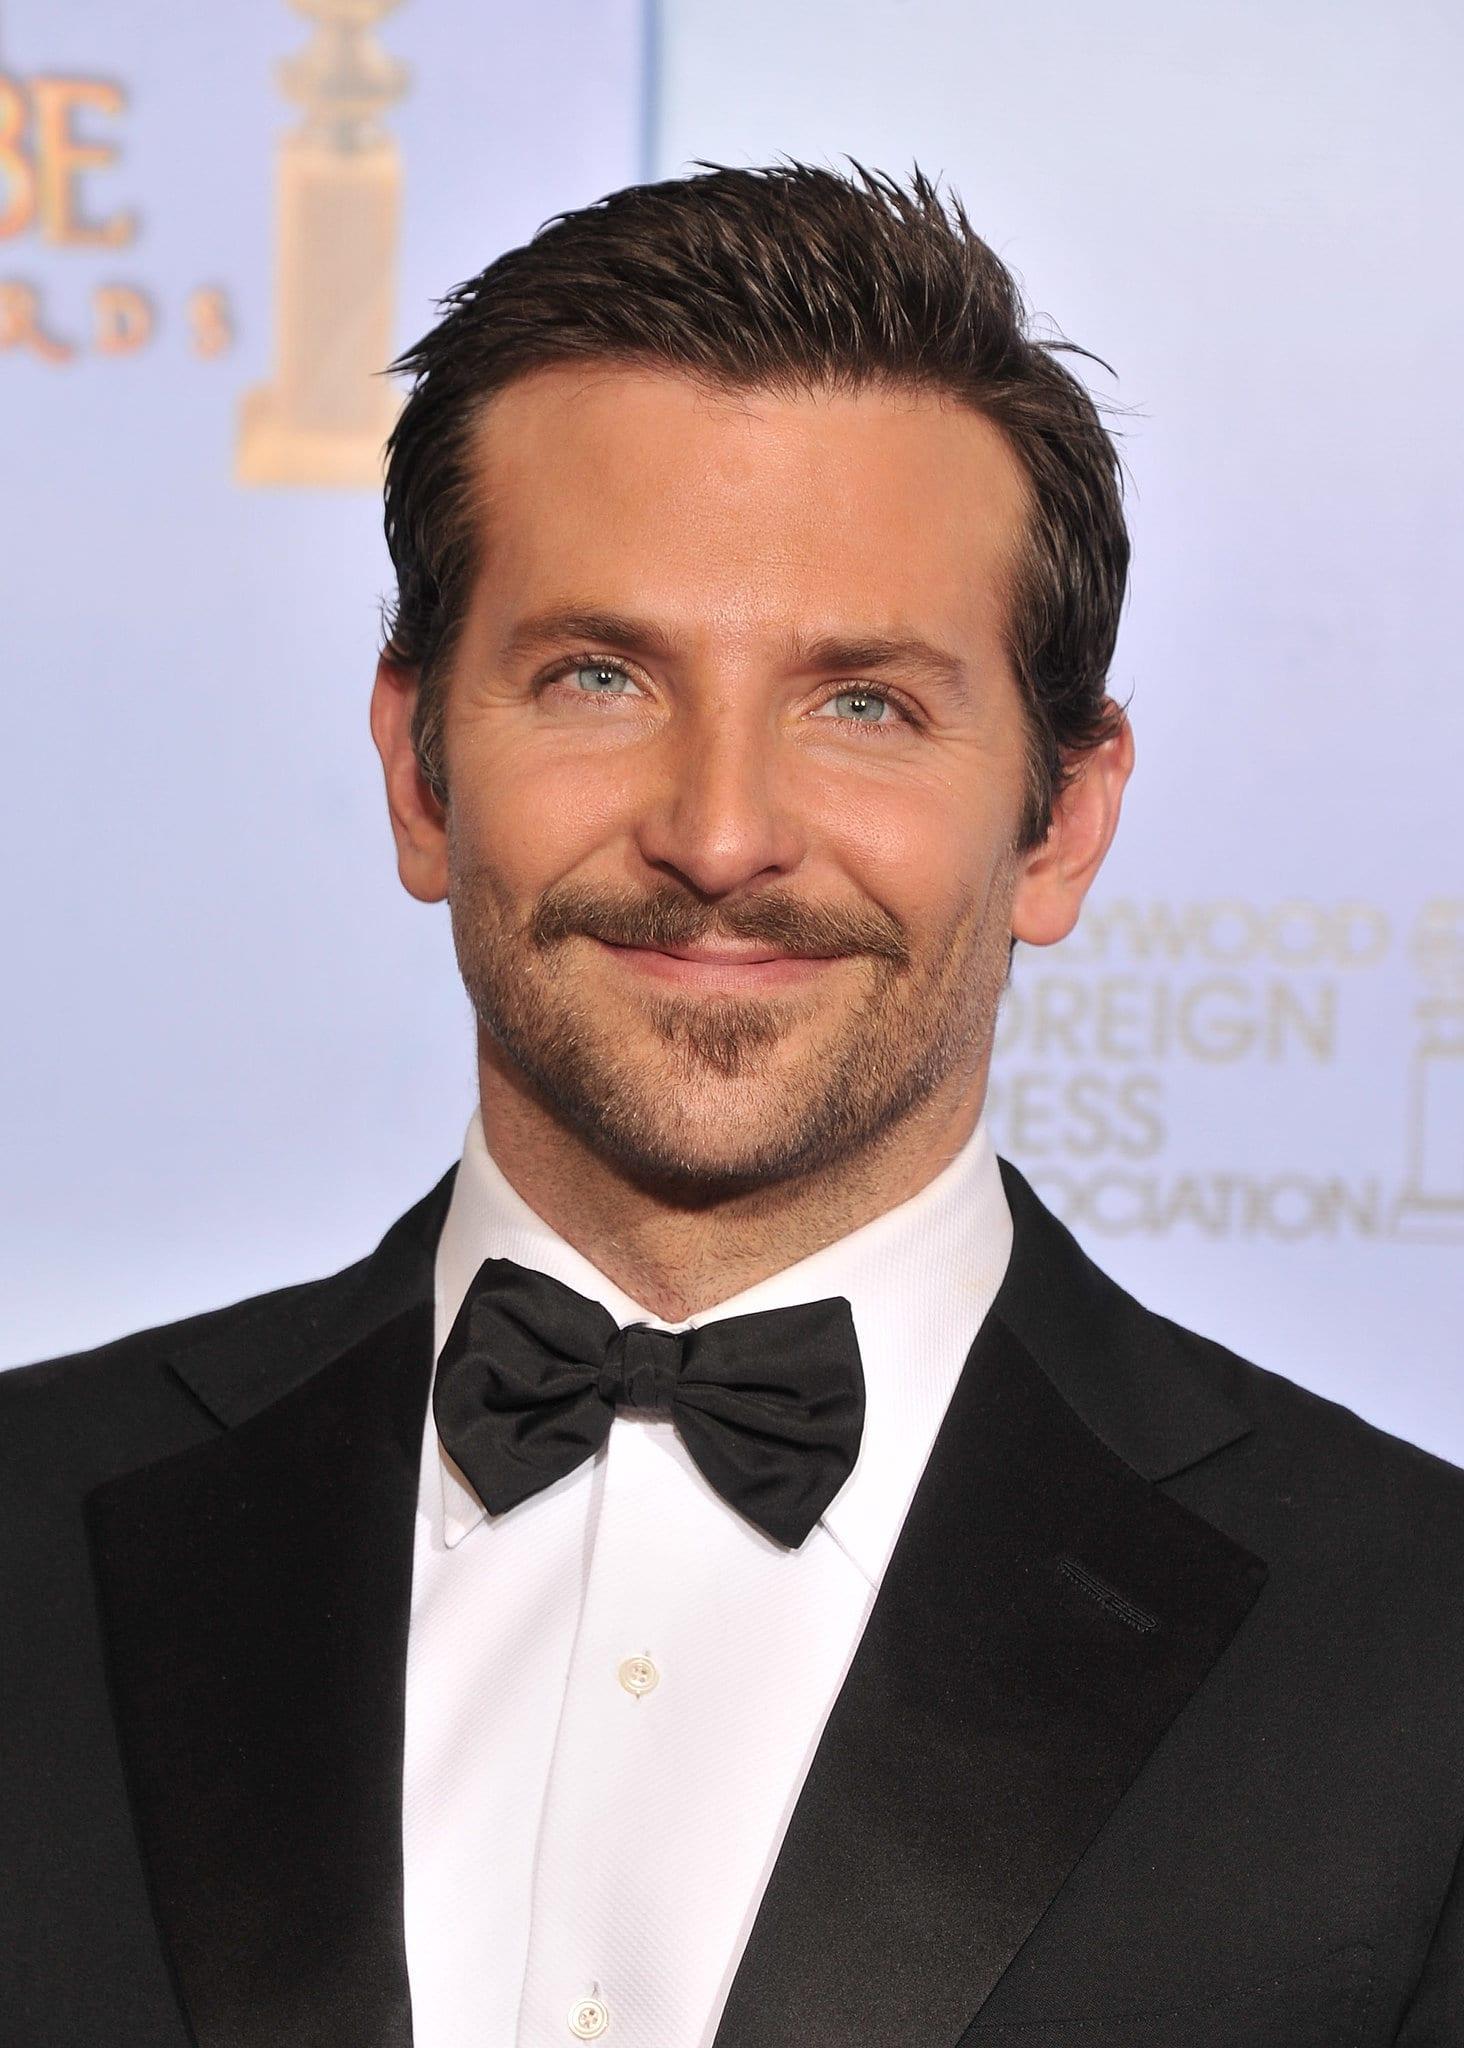 bradley cooper tycoon moustache men celeb styles